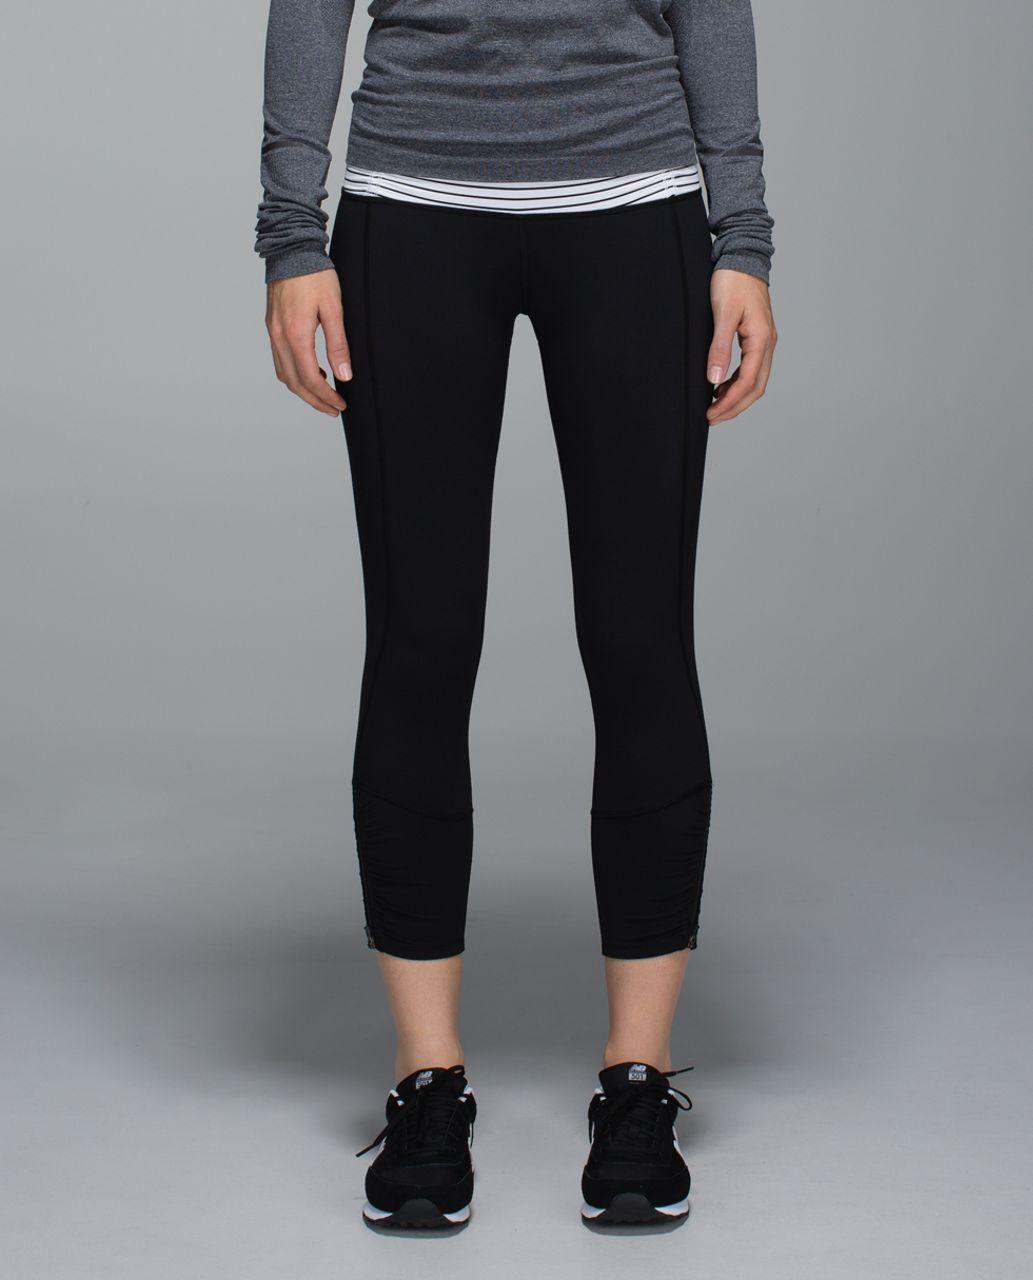 4960e12792 Lululemon Runday Crop - Black / Parallel Stripe White Black - lulu fanatics